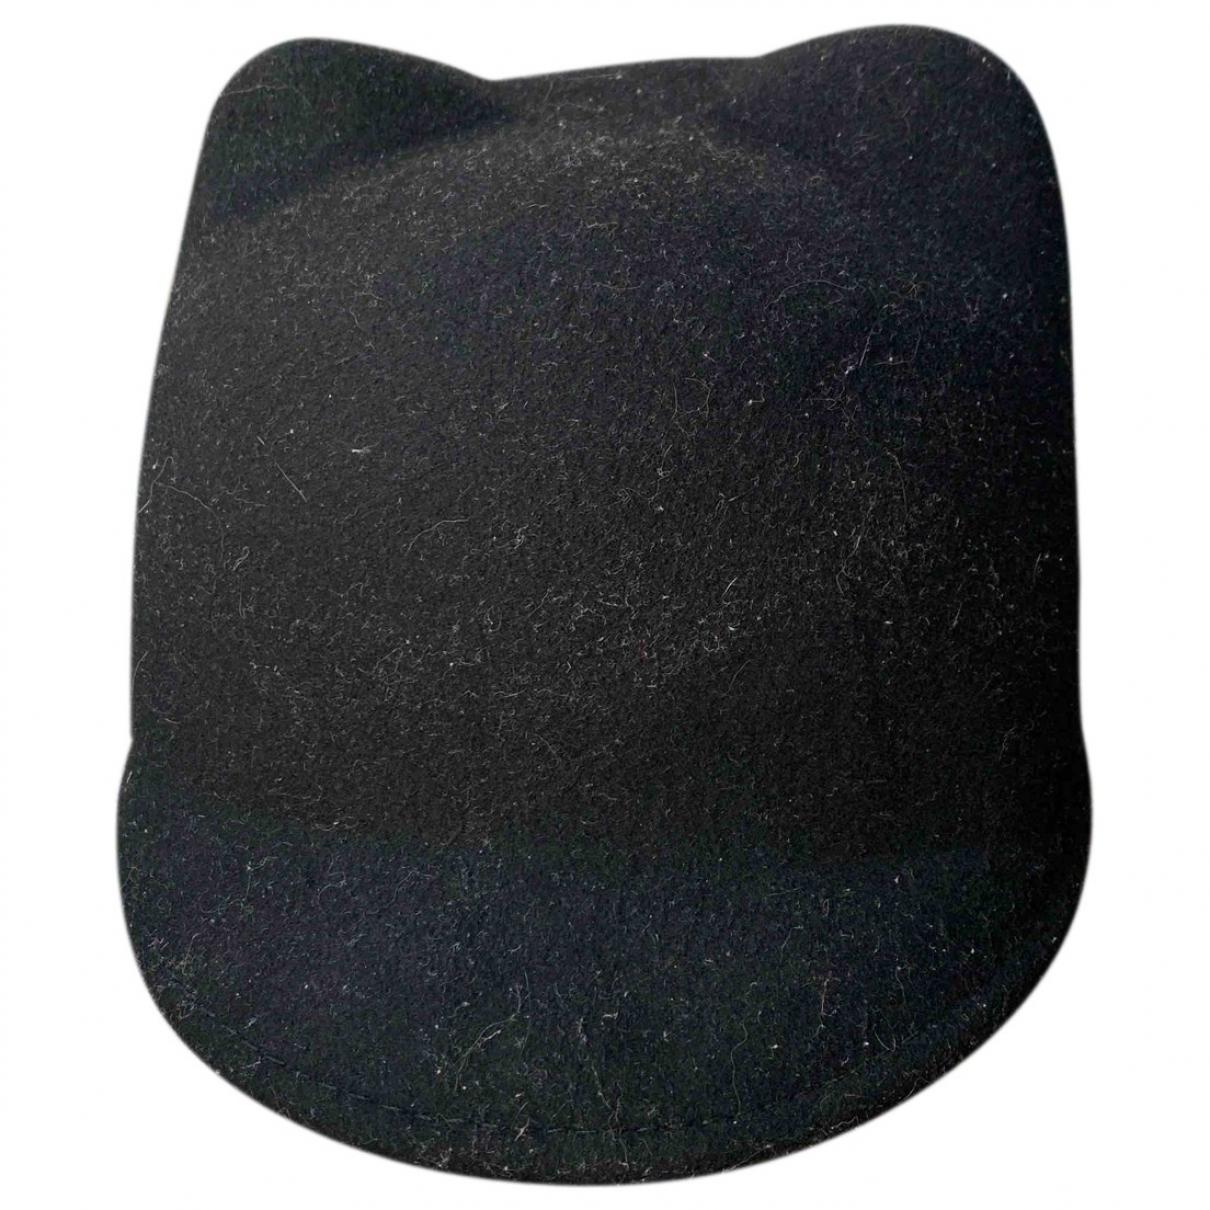 Maison Scotch \N Black Wool hat for Women M International